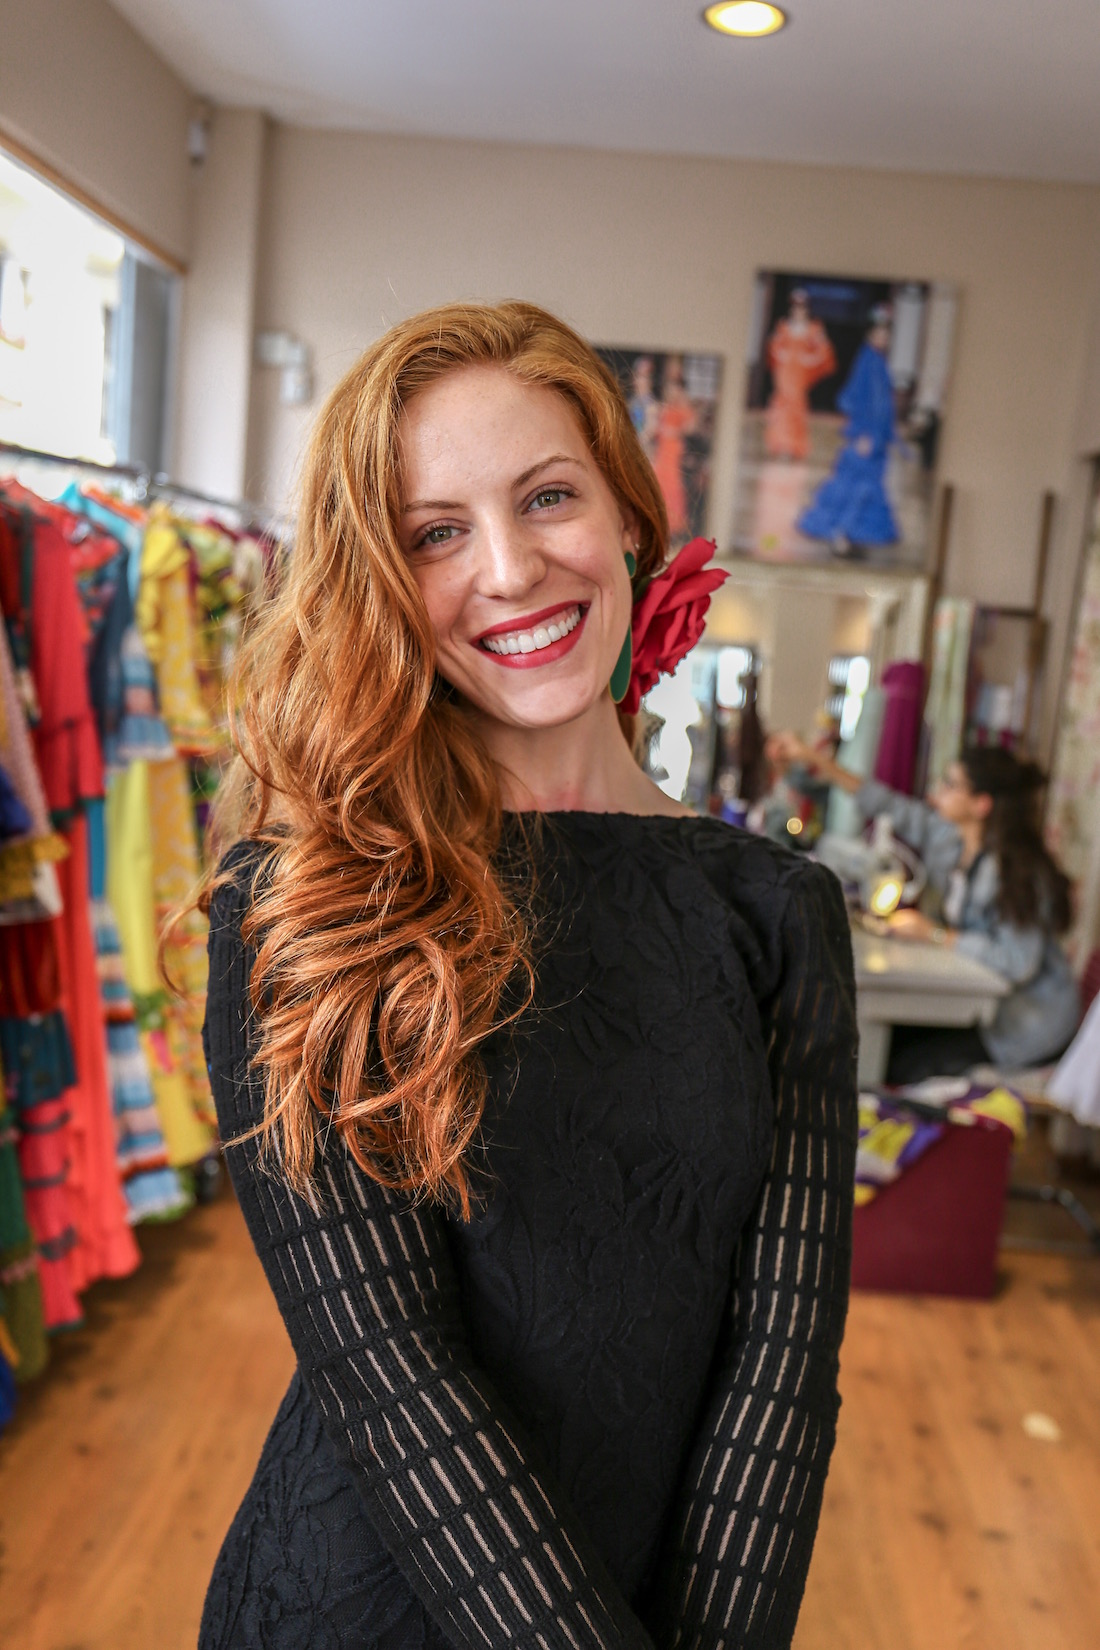 travel-blog-redhead-round-the-world-blogger-sevilla-flamenca.JPG